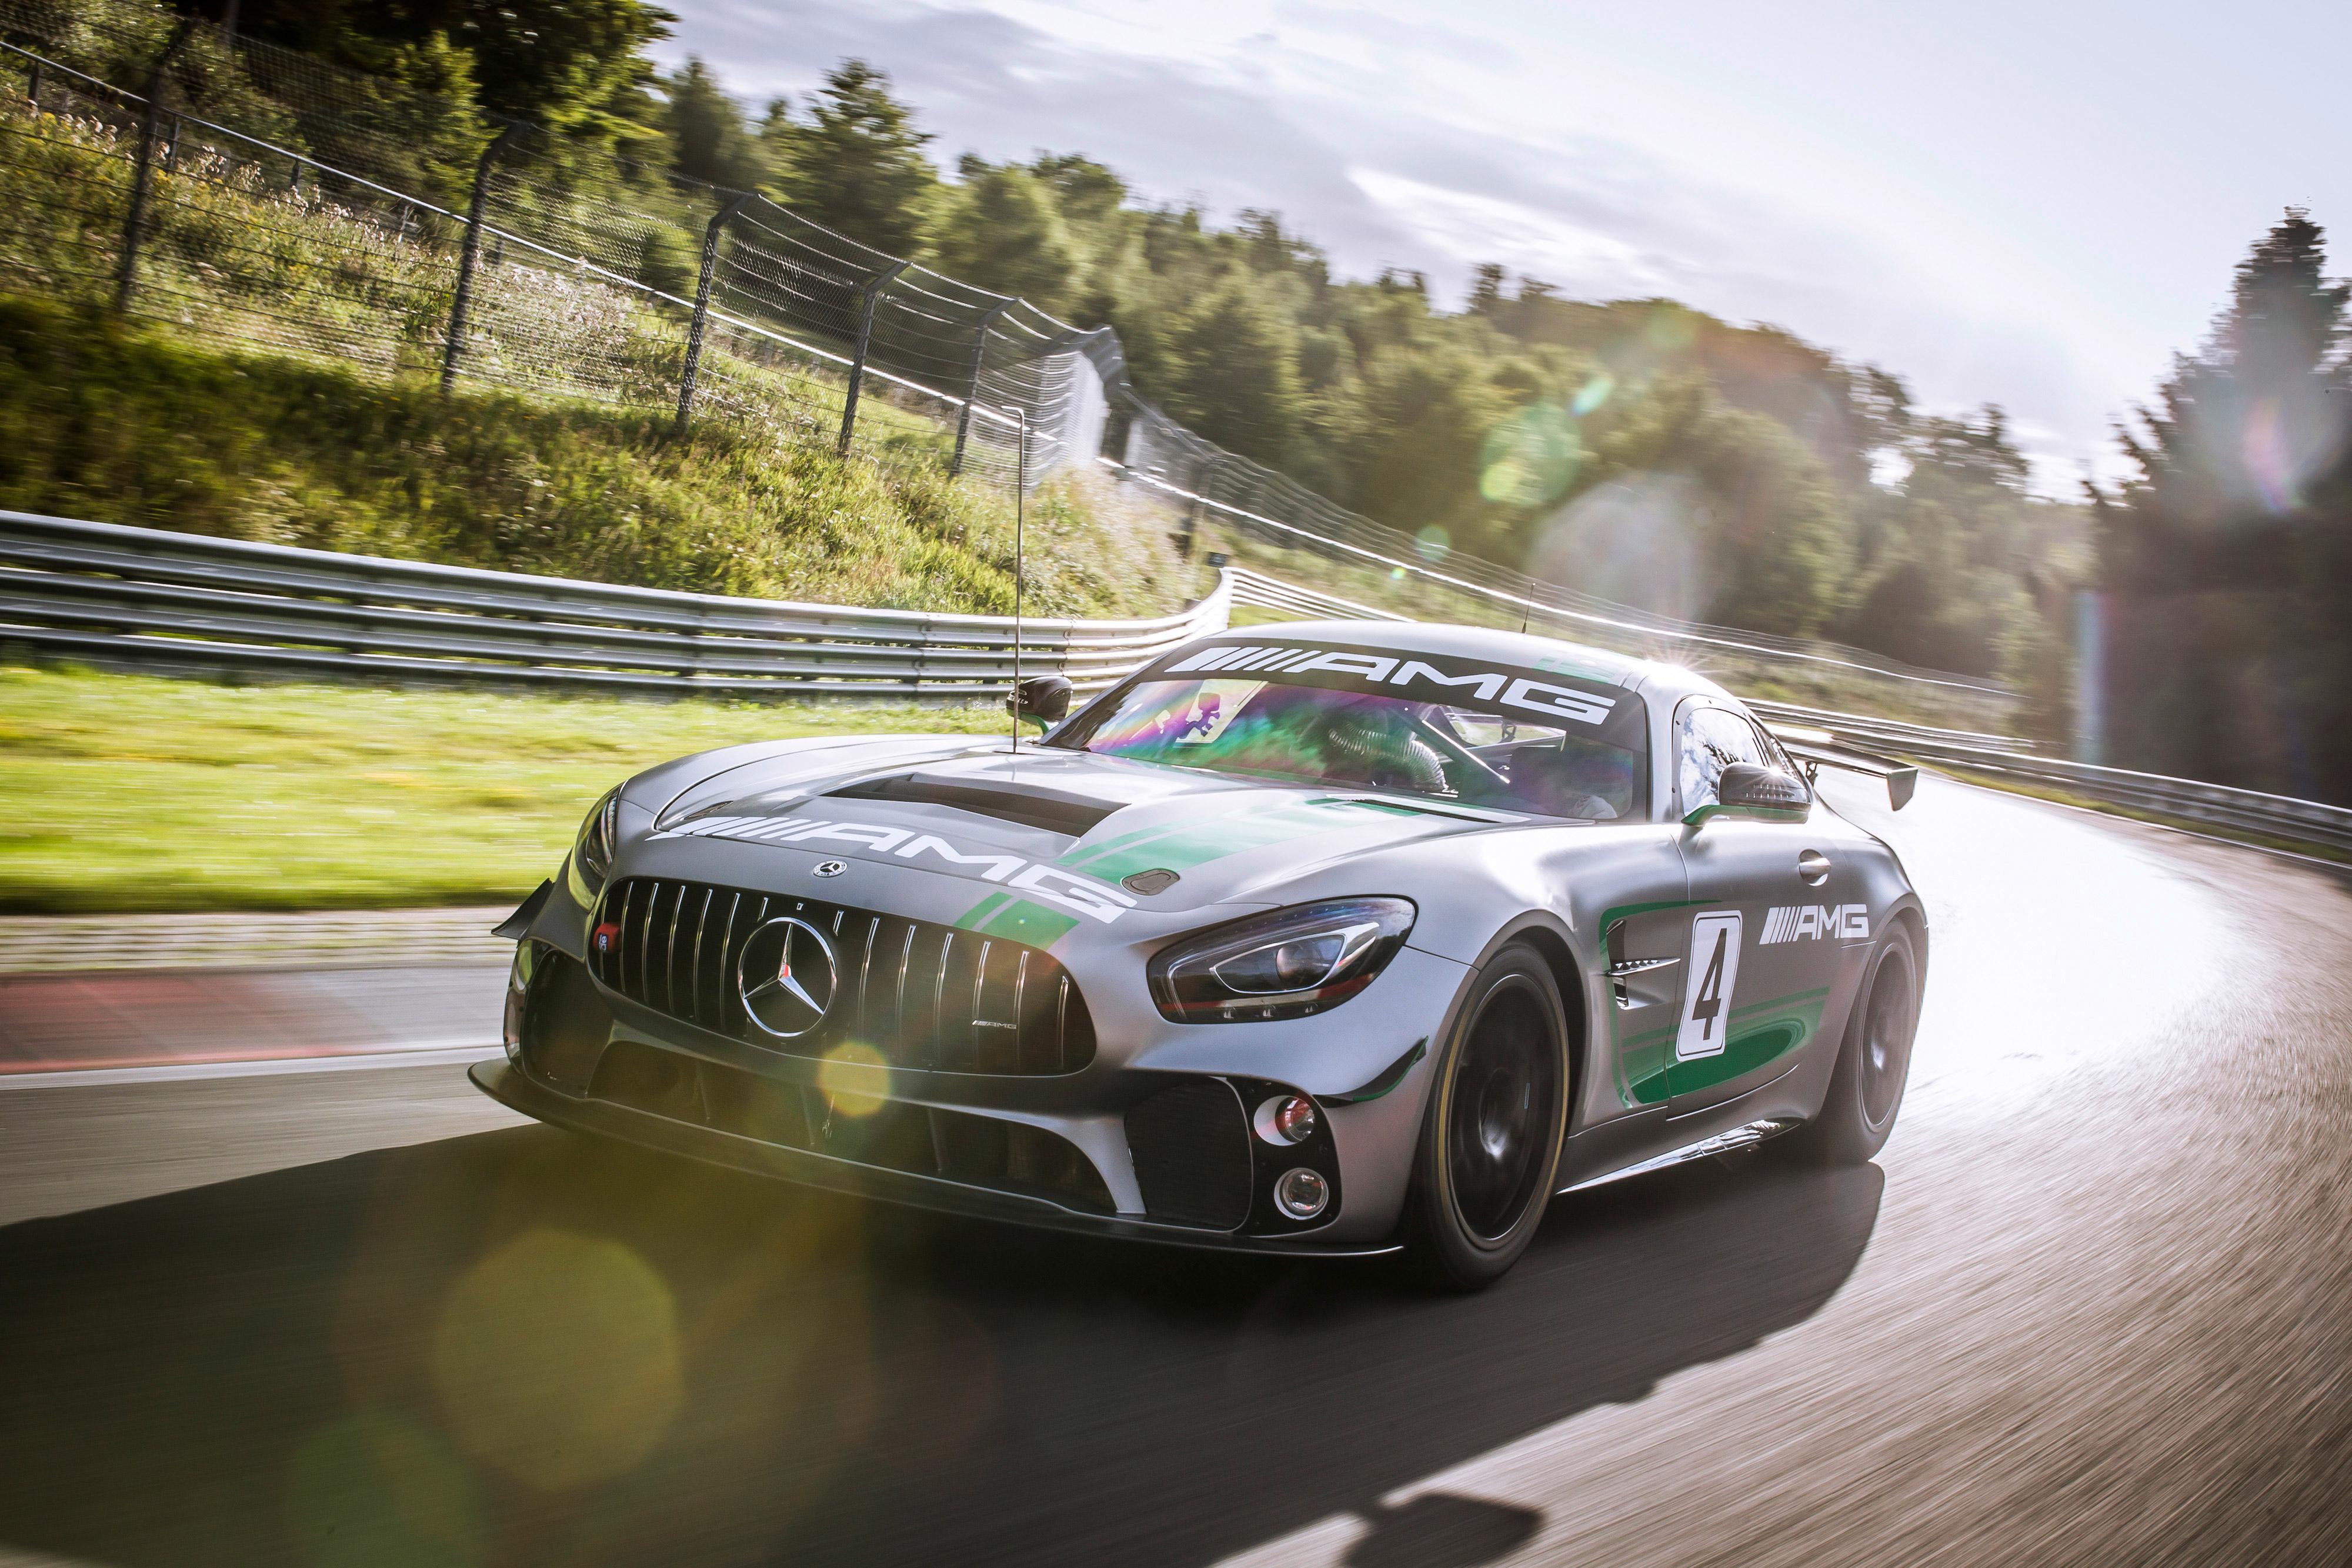 2017 Mercedes Amg Gt4 C190 4k Hd Cars 4k Wallpapers